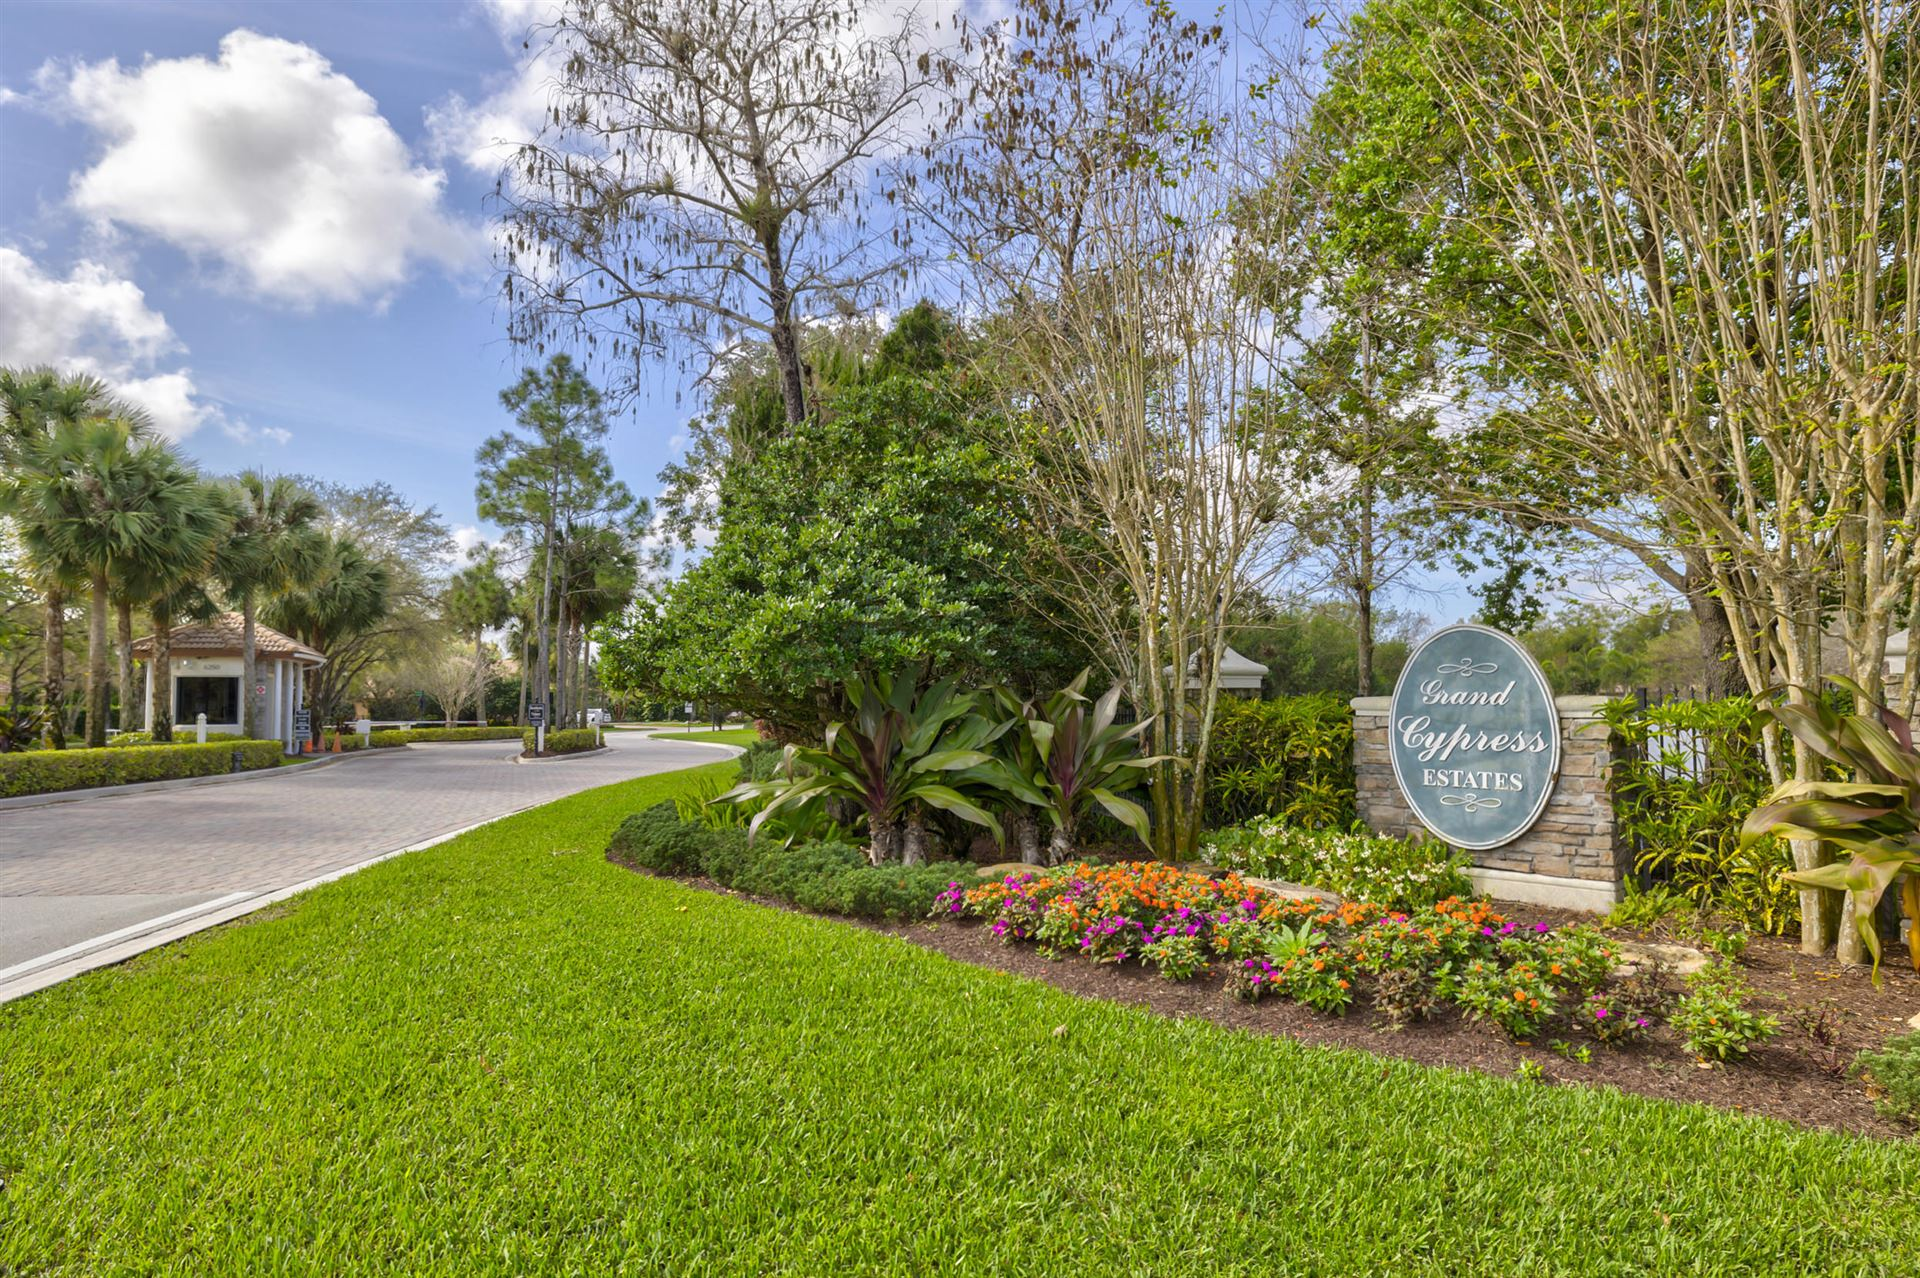 Photo of 6268 NW 92 Avenue, Parkland, FL 33067 (MLS # RX-10697145)